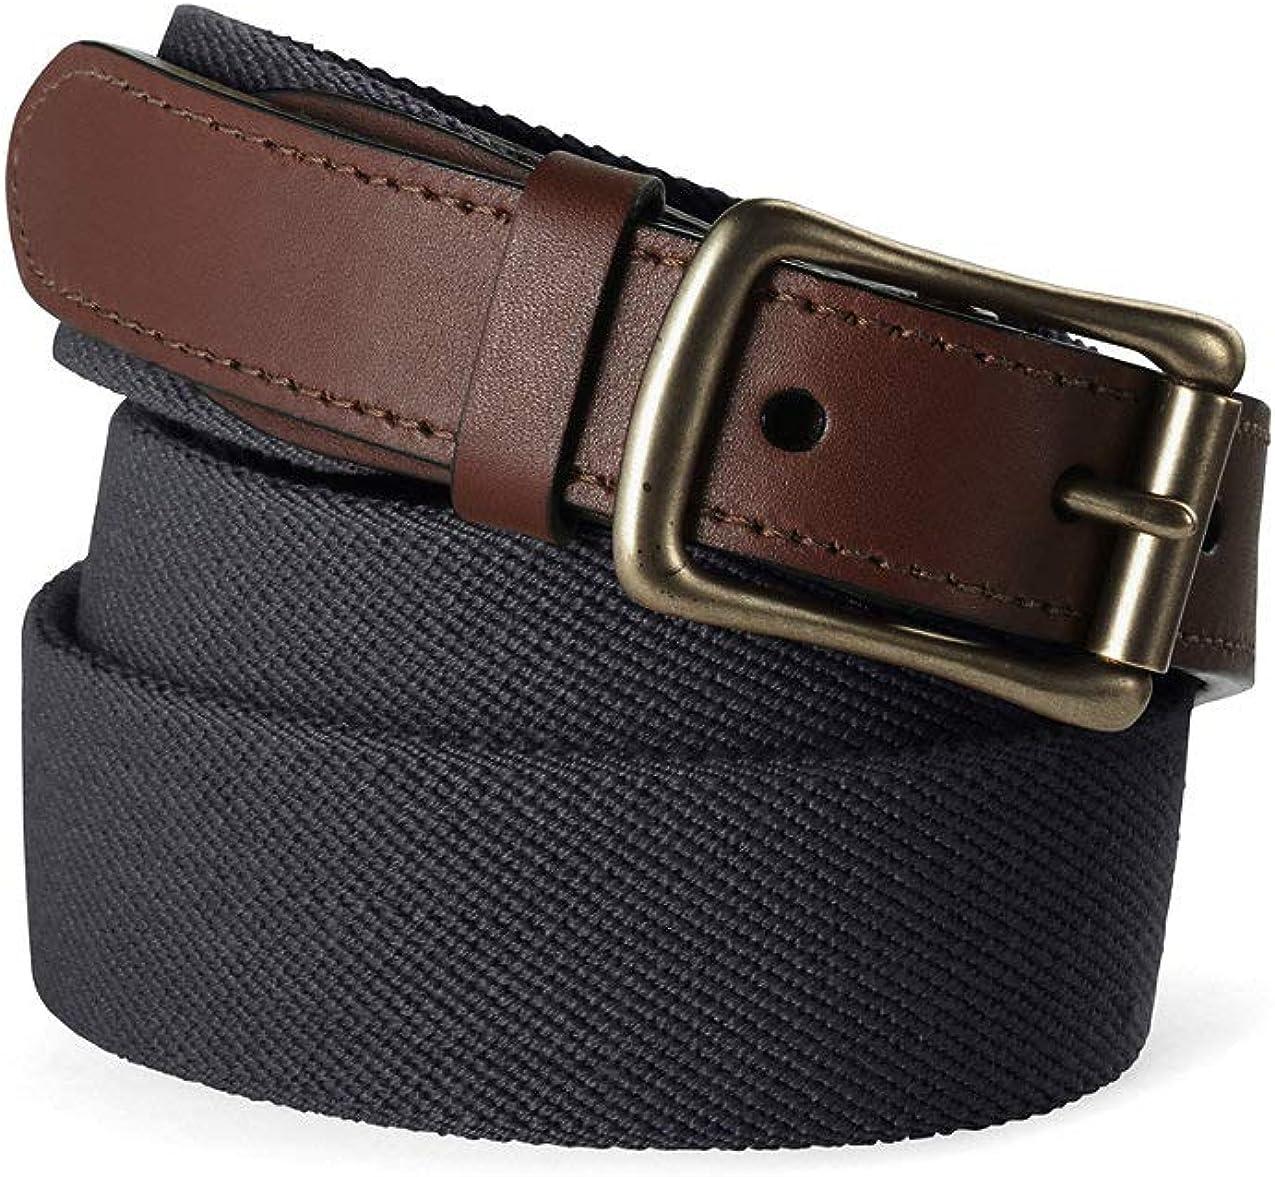 Max 79% OFF Lands' End Men's Belt Surcingle Free Shipping Cheap Bargain Gift Elastic